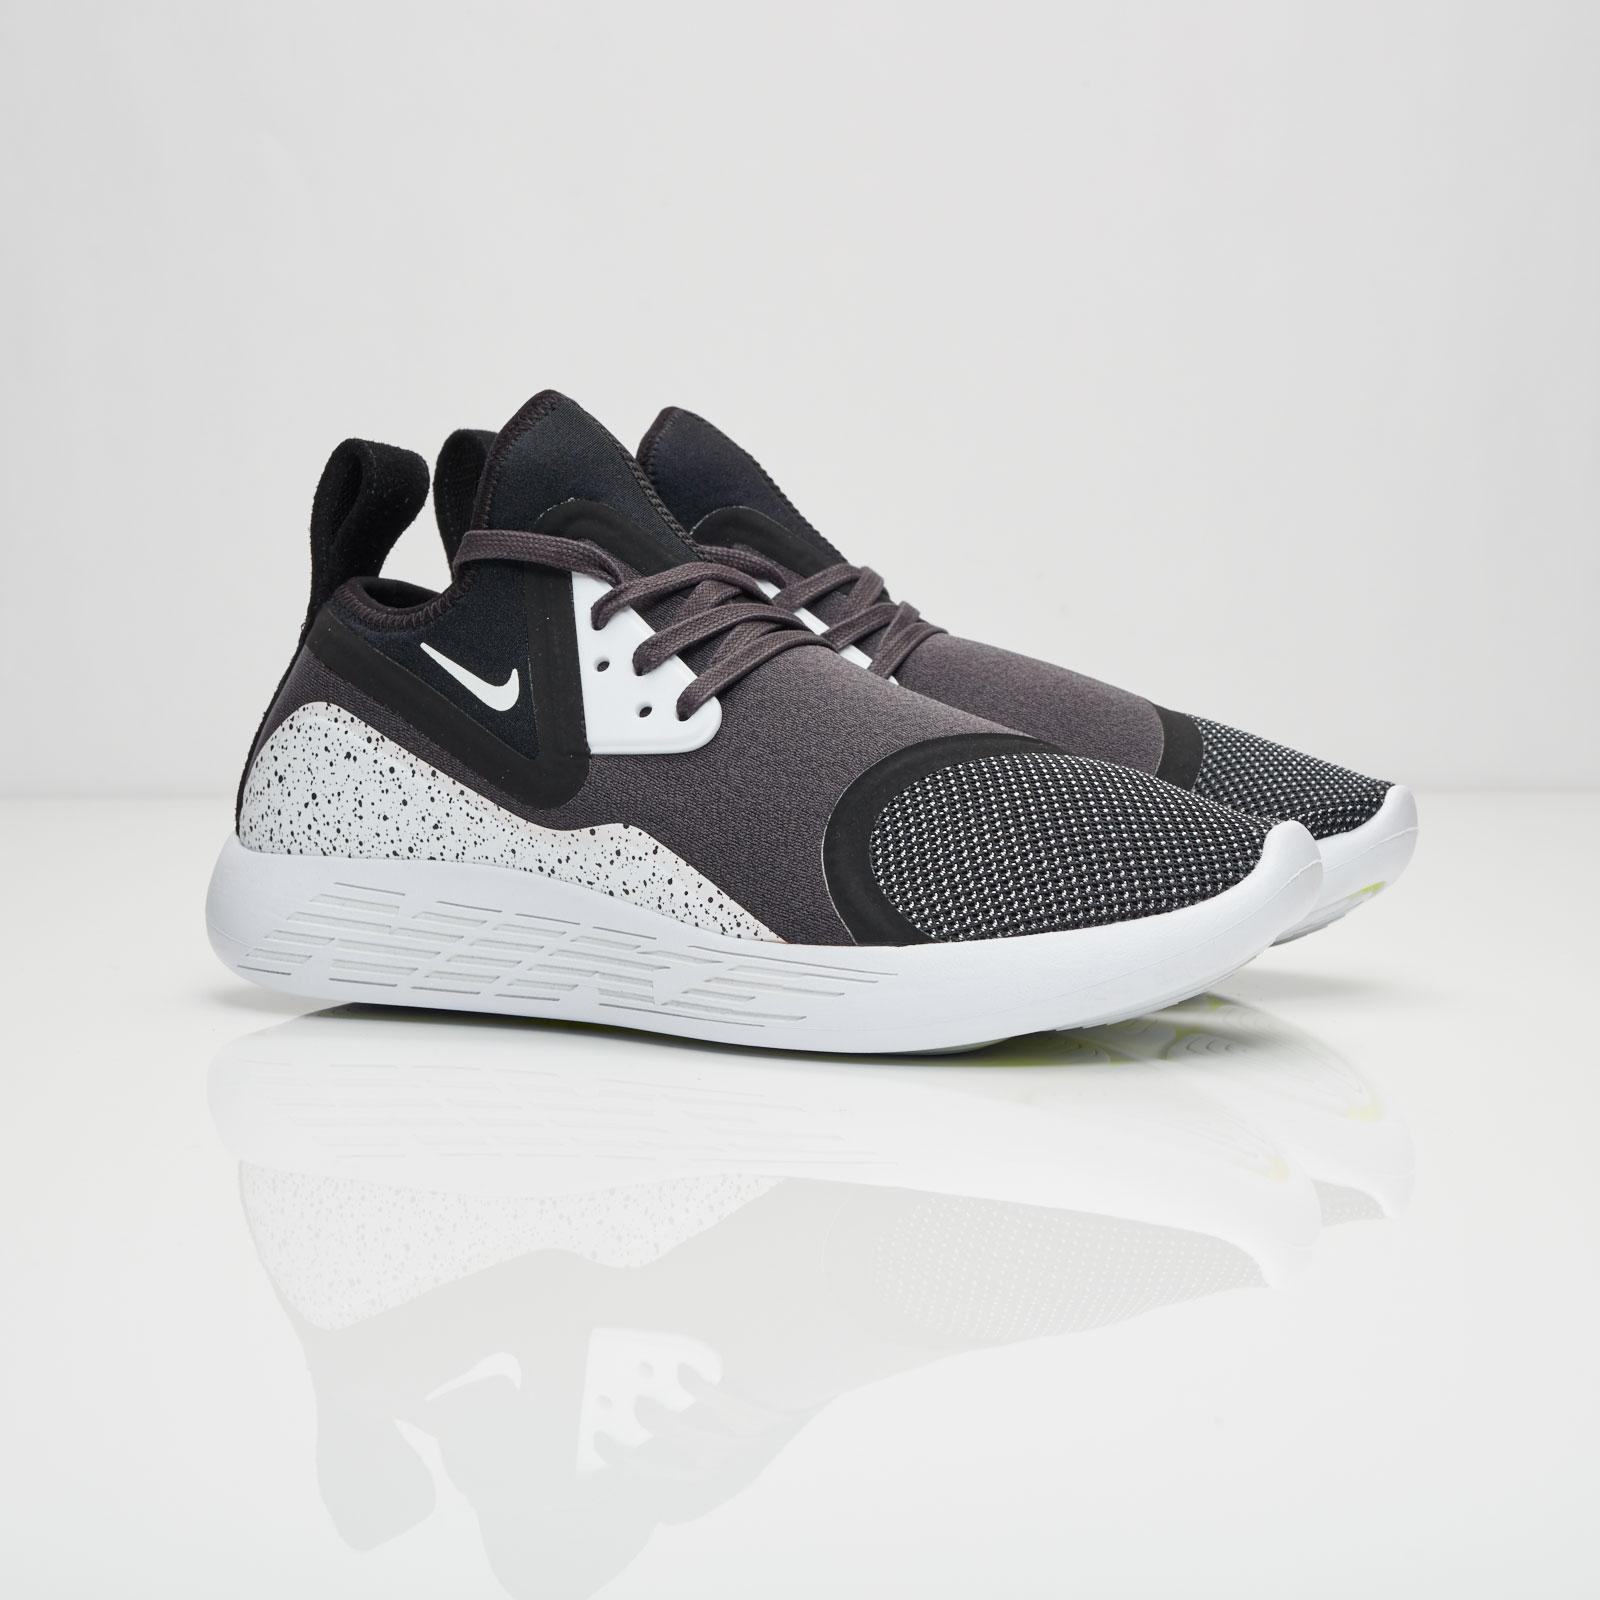 Nike Lunarcharge Premium LE - 923284-999 - Sneakersnstuff  1571a939b